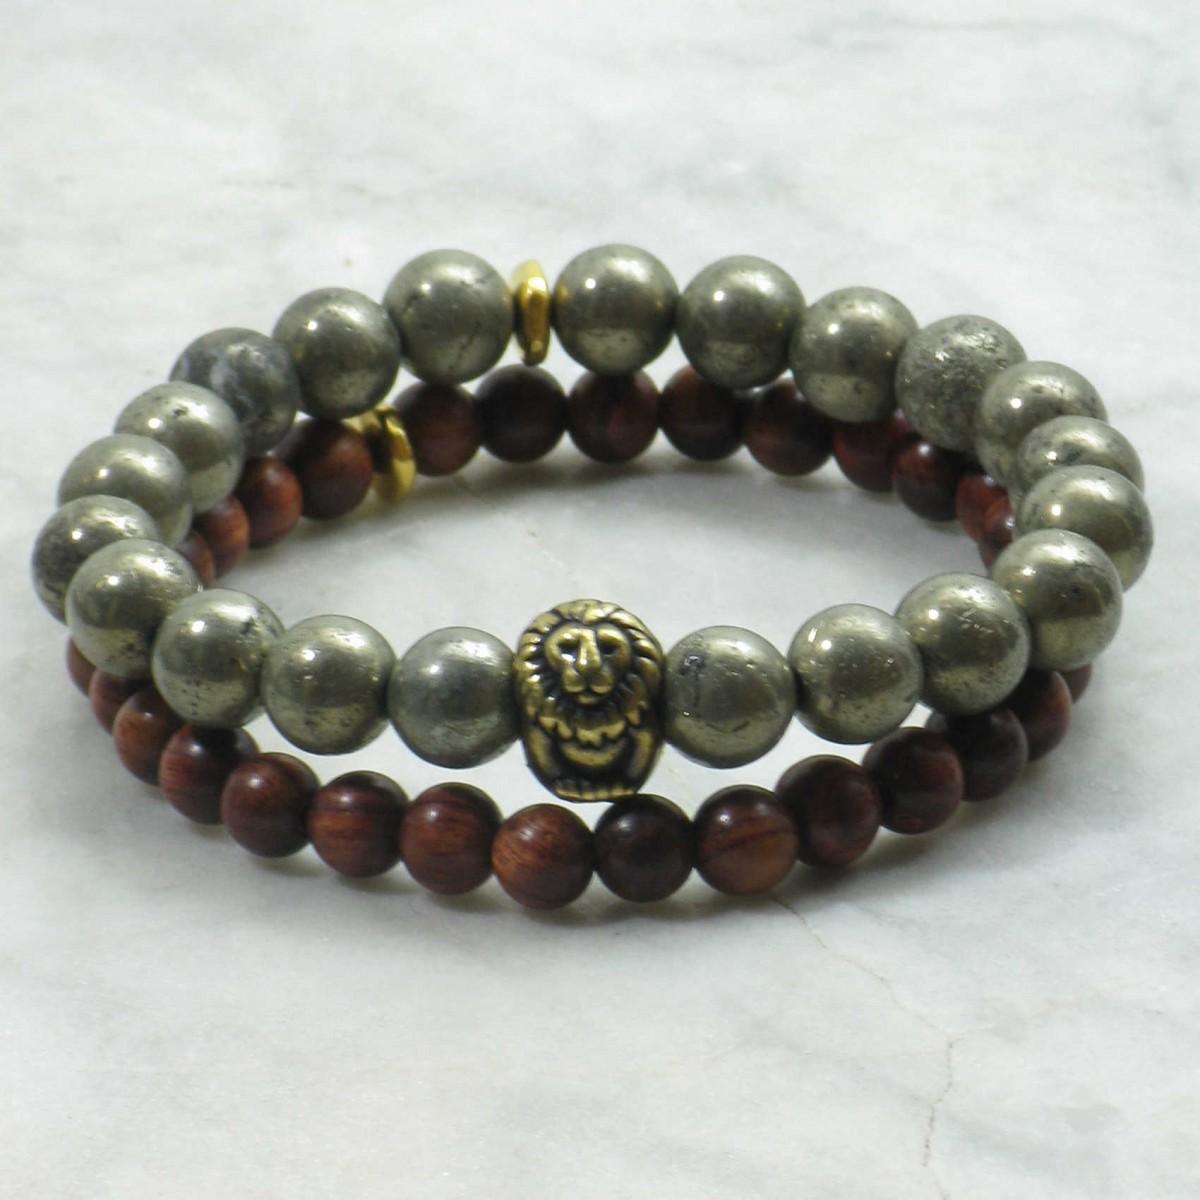 Regal_Bracelets_for_Men_Mala_Beads_Stacks_Pyrite_Mala_Beads_Rosewood_Buddhist_Prayer_Beads